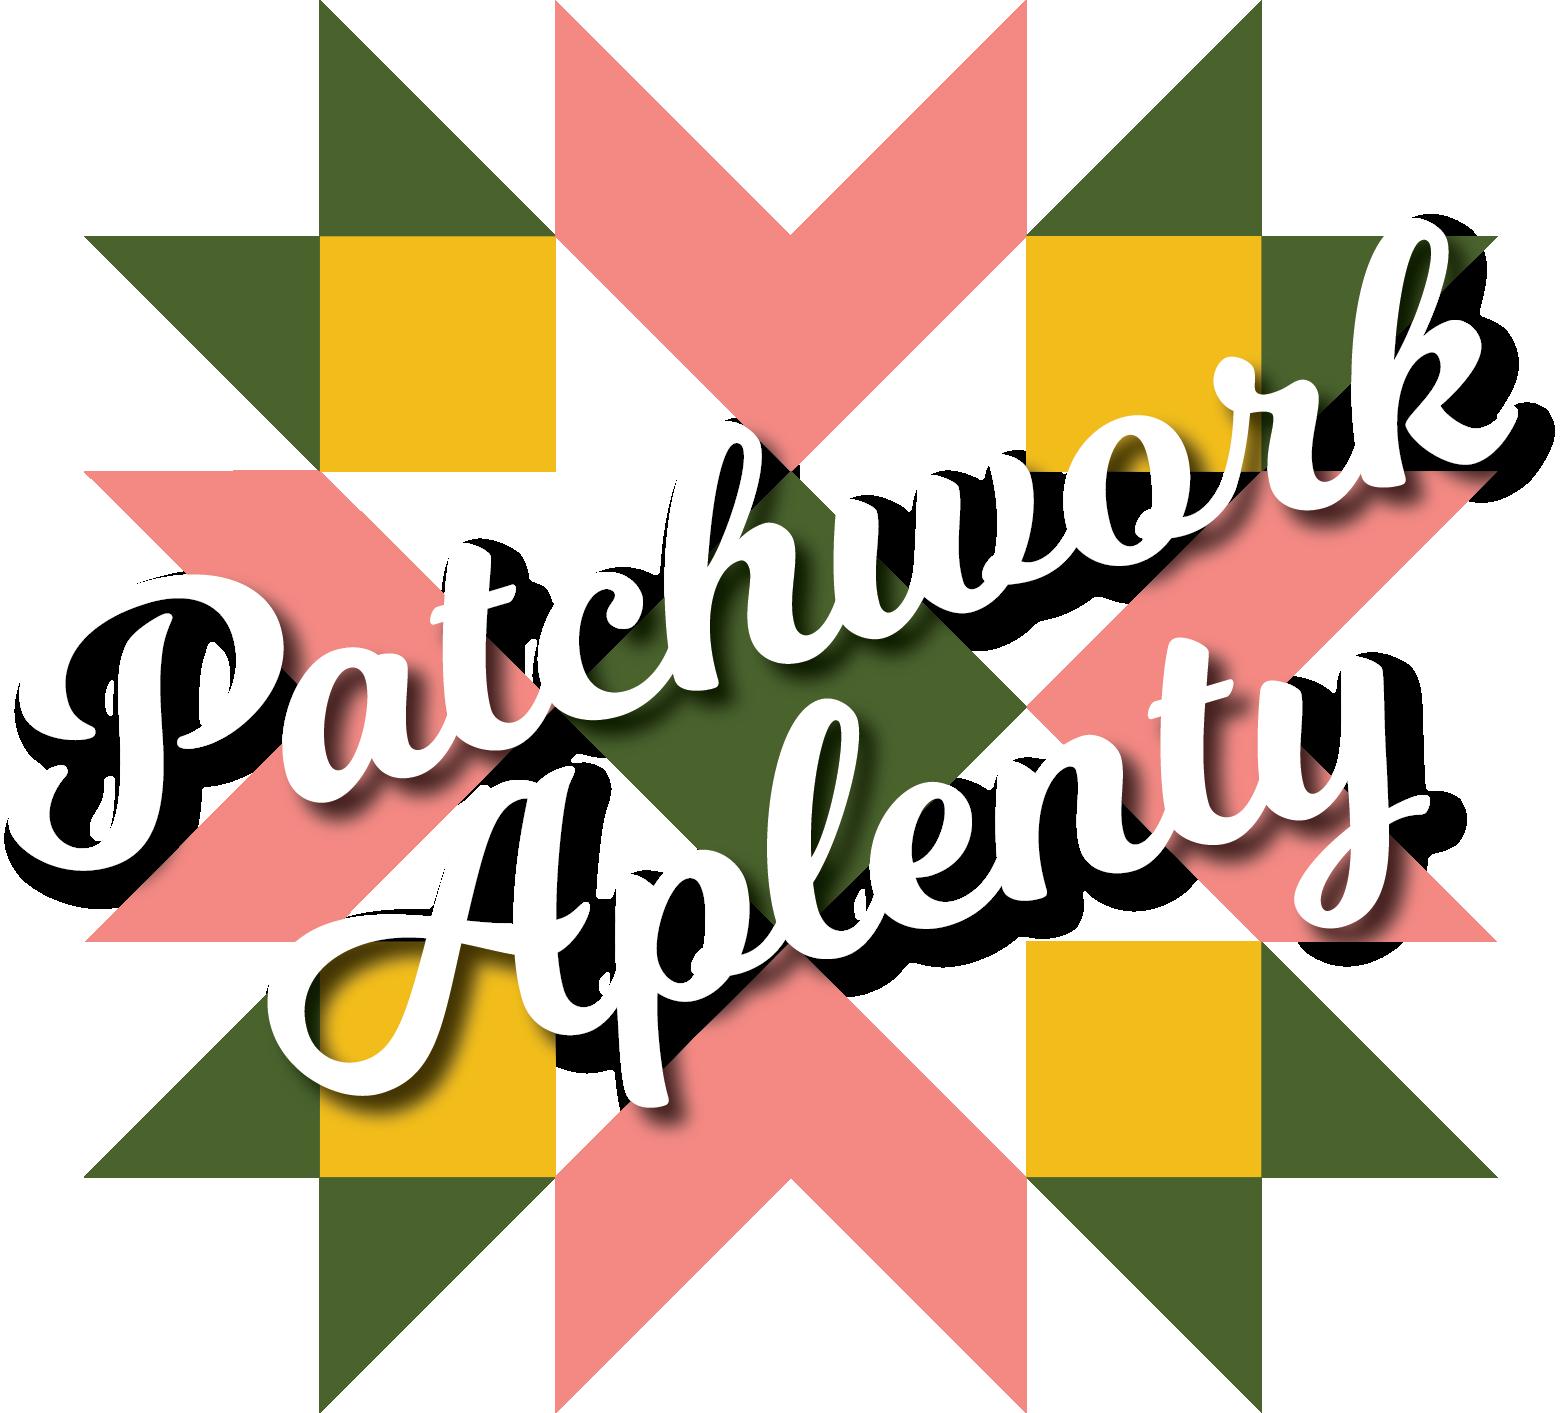 Patchwork Aplenty